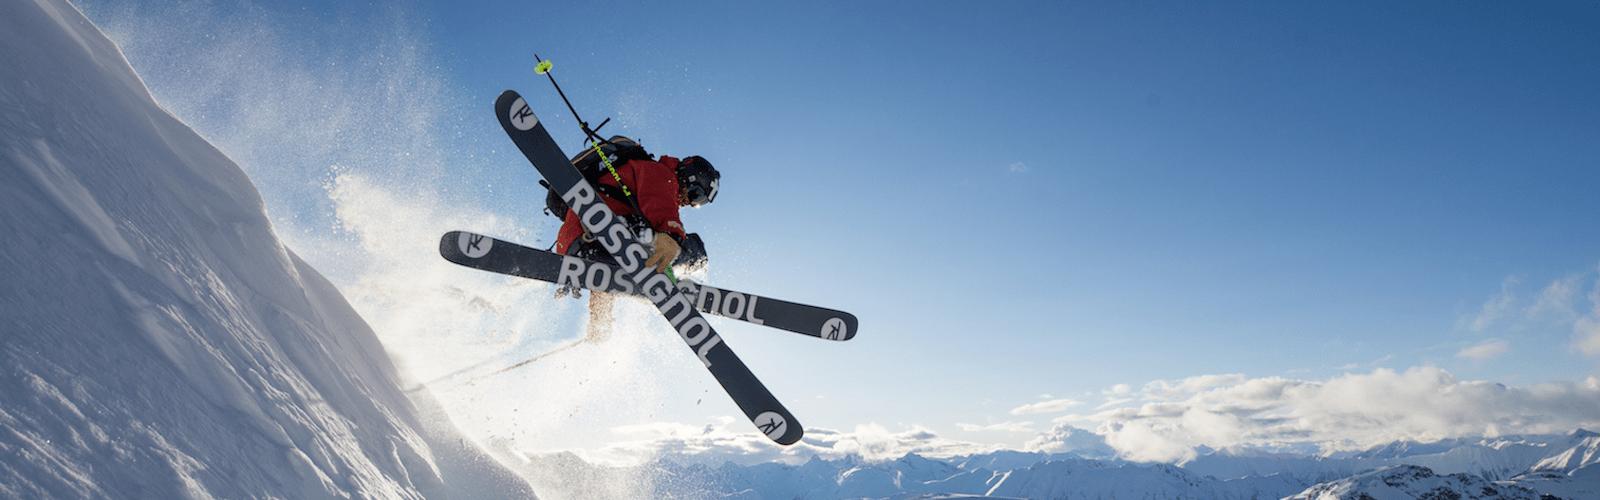 Sport Milanovic - top Freeride Ausrüstung